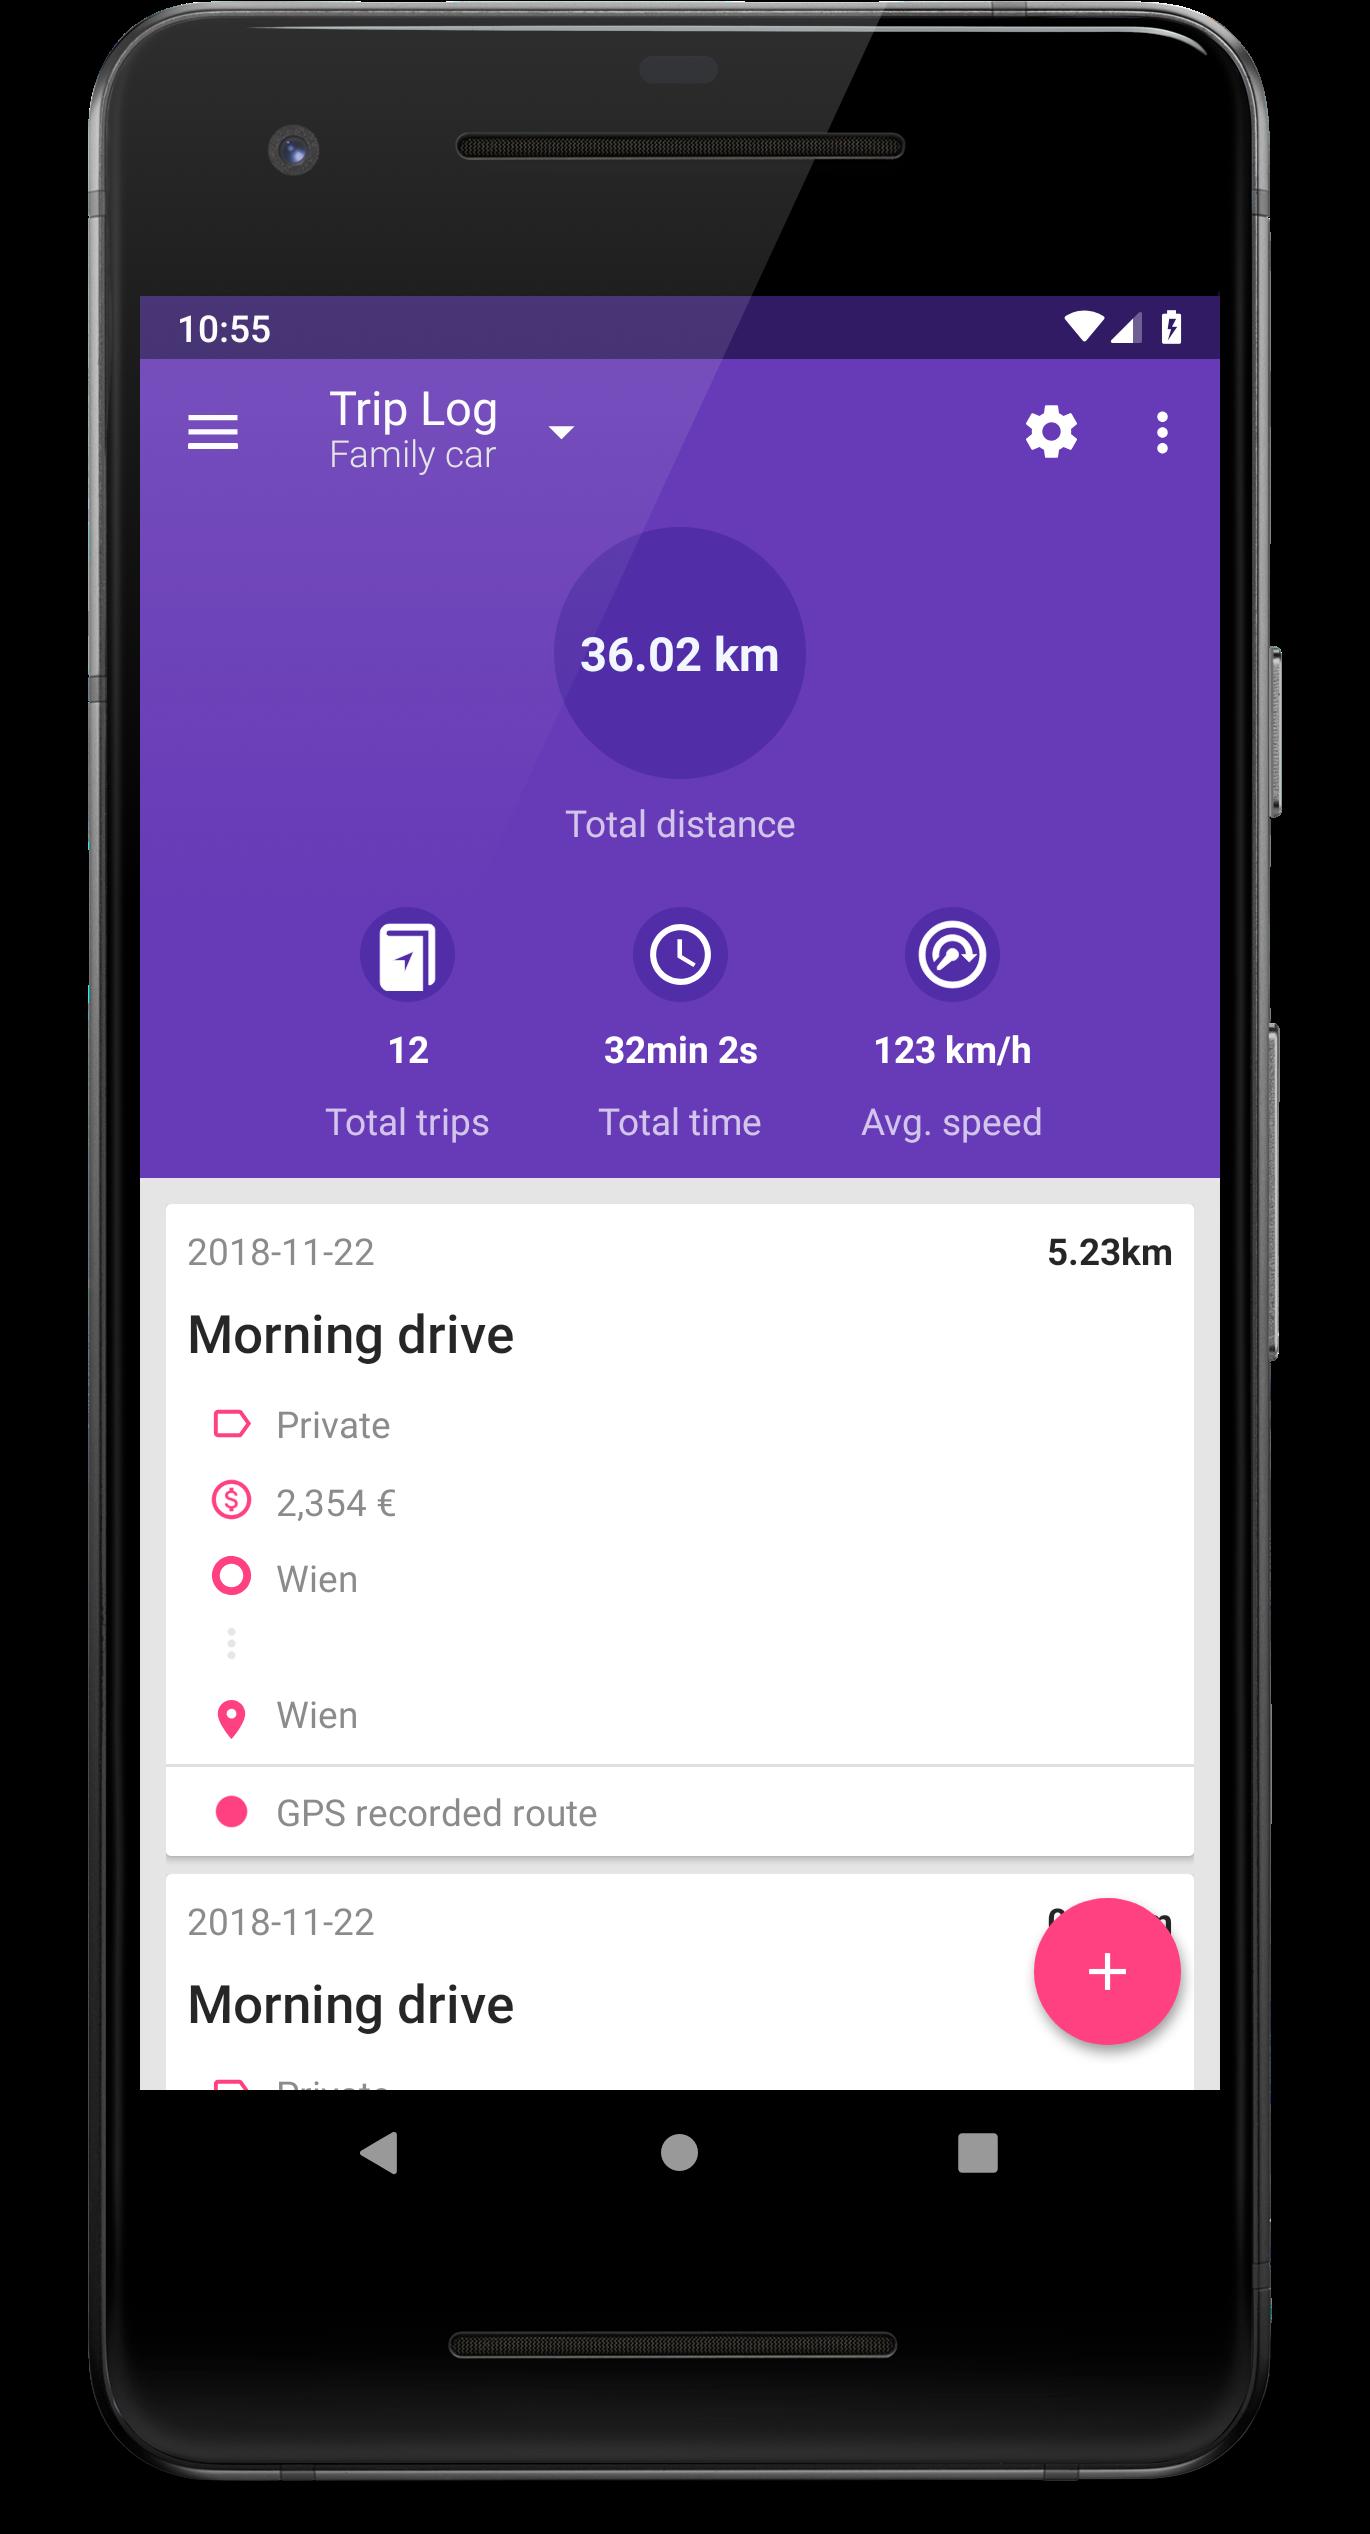 fuelio trip log gps mileage tracker